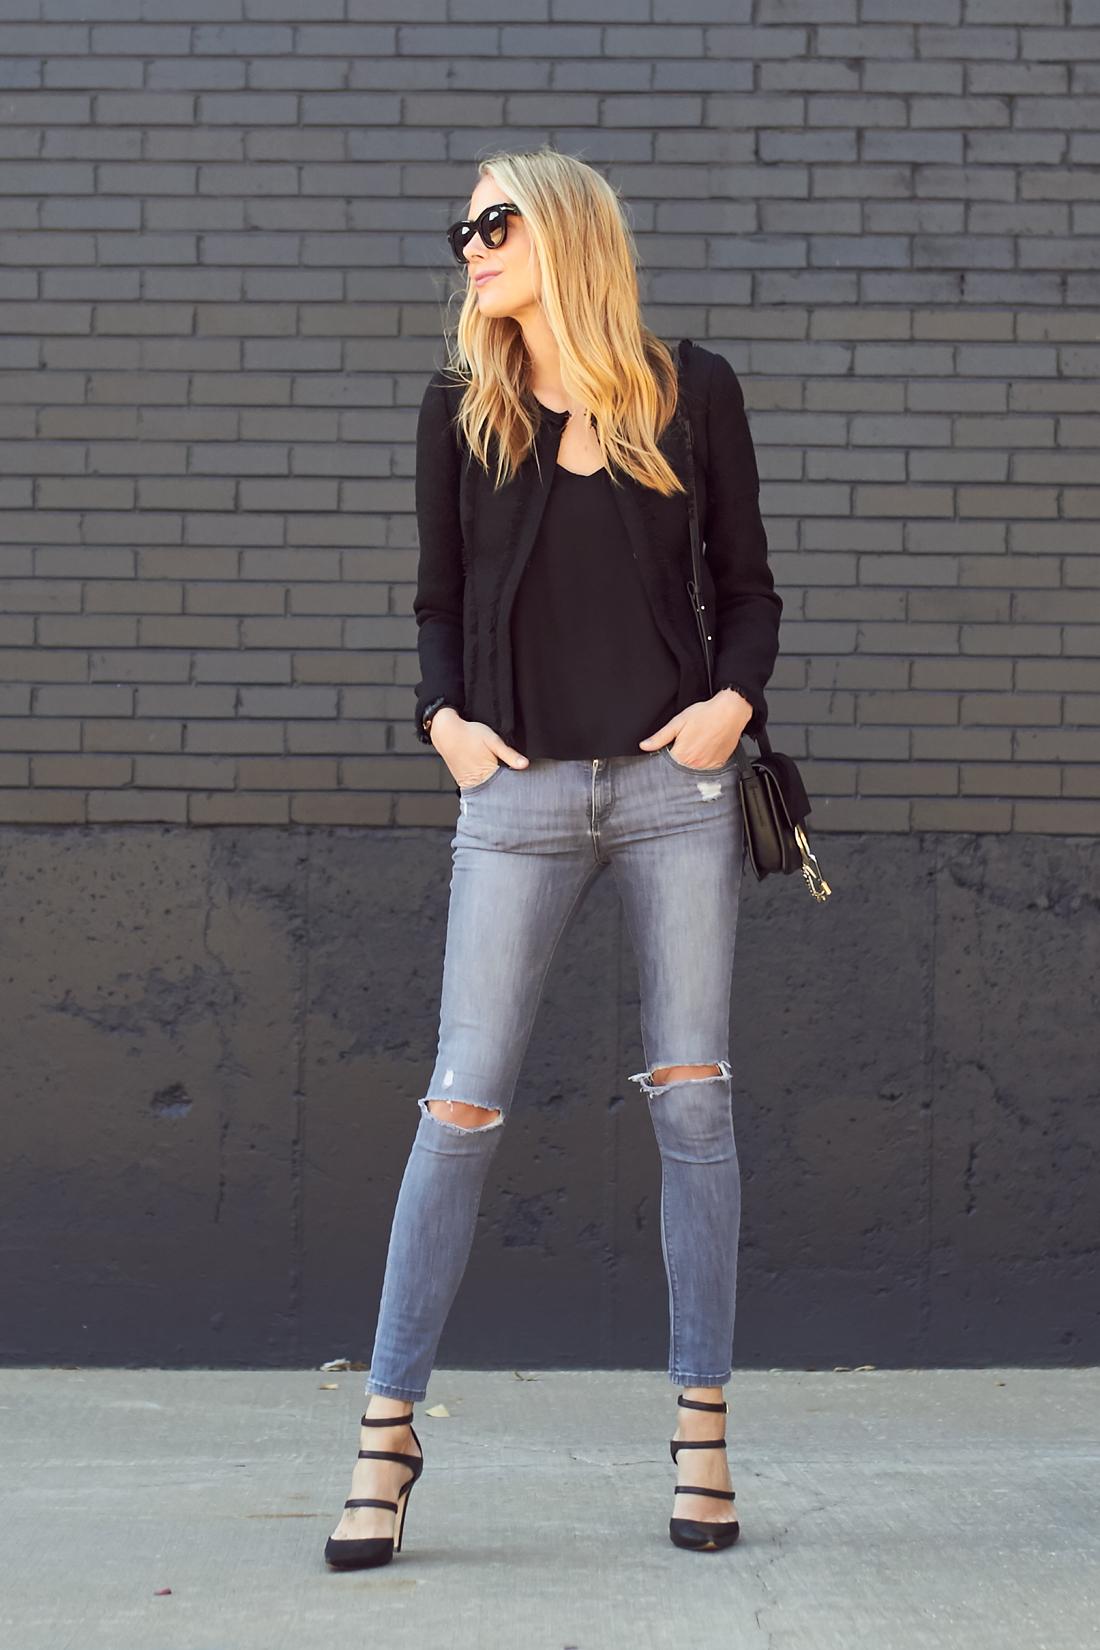 fashion-jackson-black-tweed-jacket-grey-ripped-skinny-jeans-triple-strap-pumps